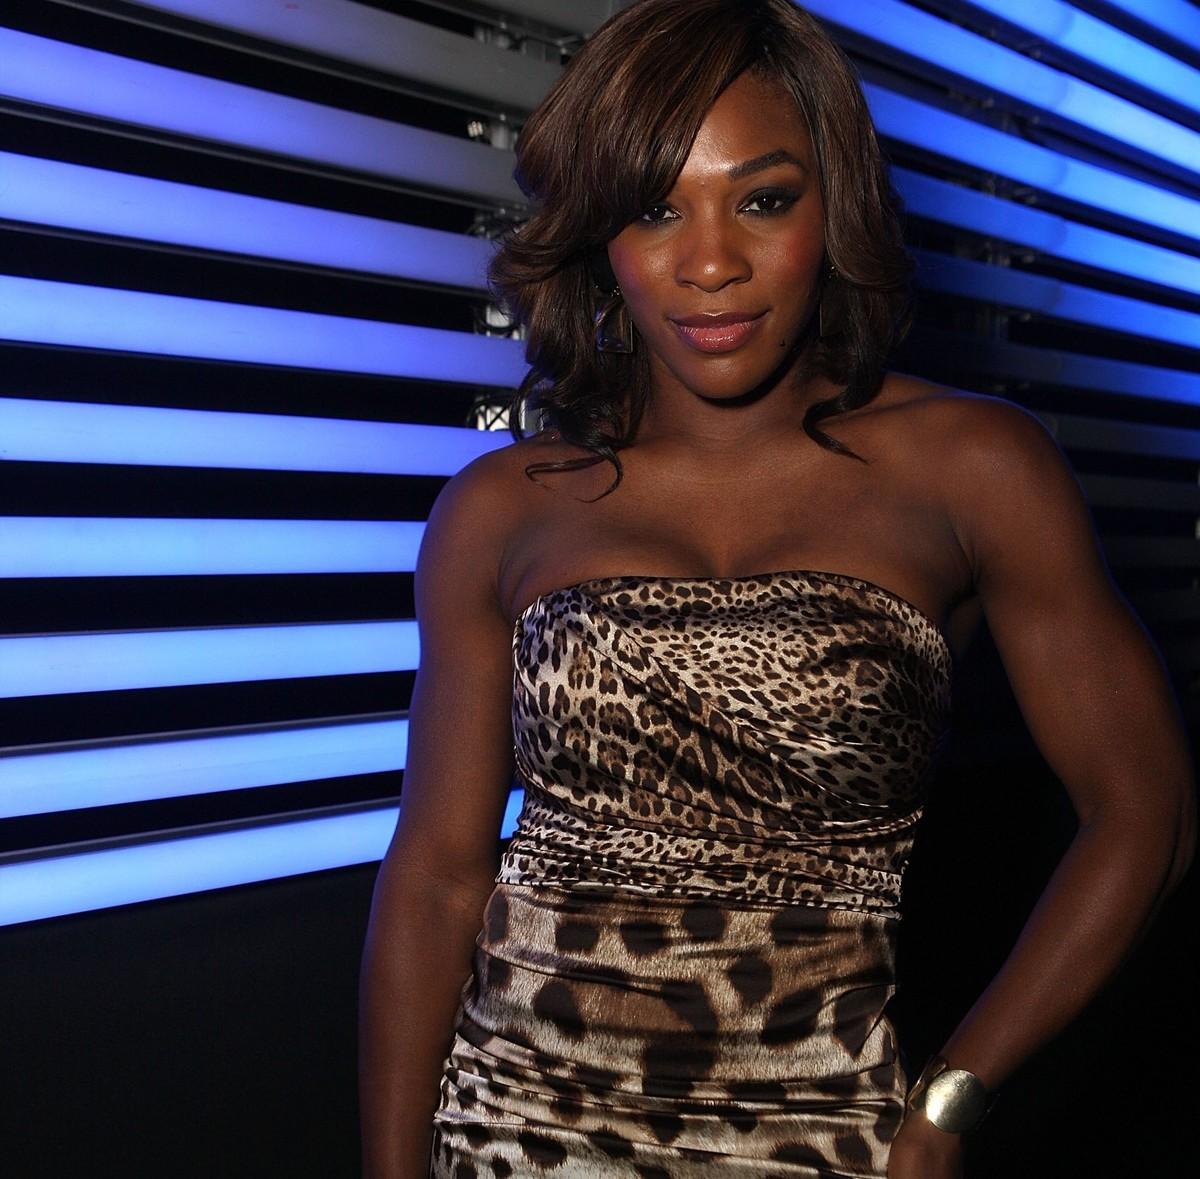 Serena wears a cheetah-print outfit.